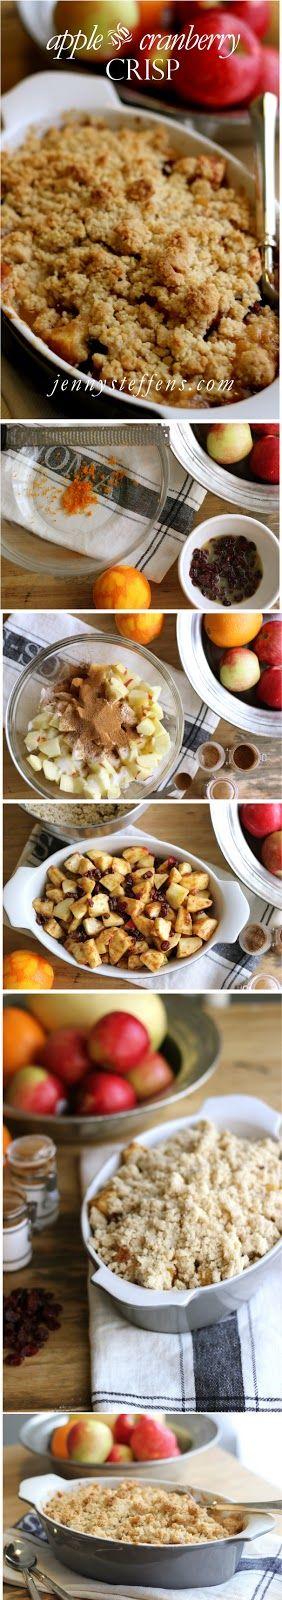 Apple Cranberry Crisp... smells like Fall baking in your kitchen!  http://jennysteffens.blogspot.com/2012/10/apple-cranberry-crisp-comforting.html